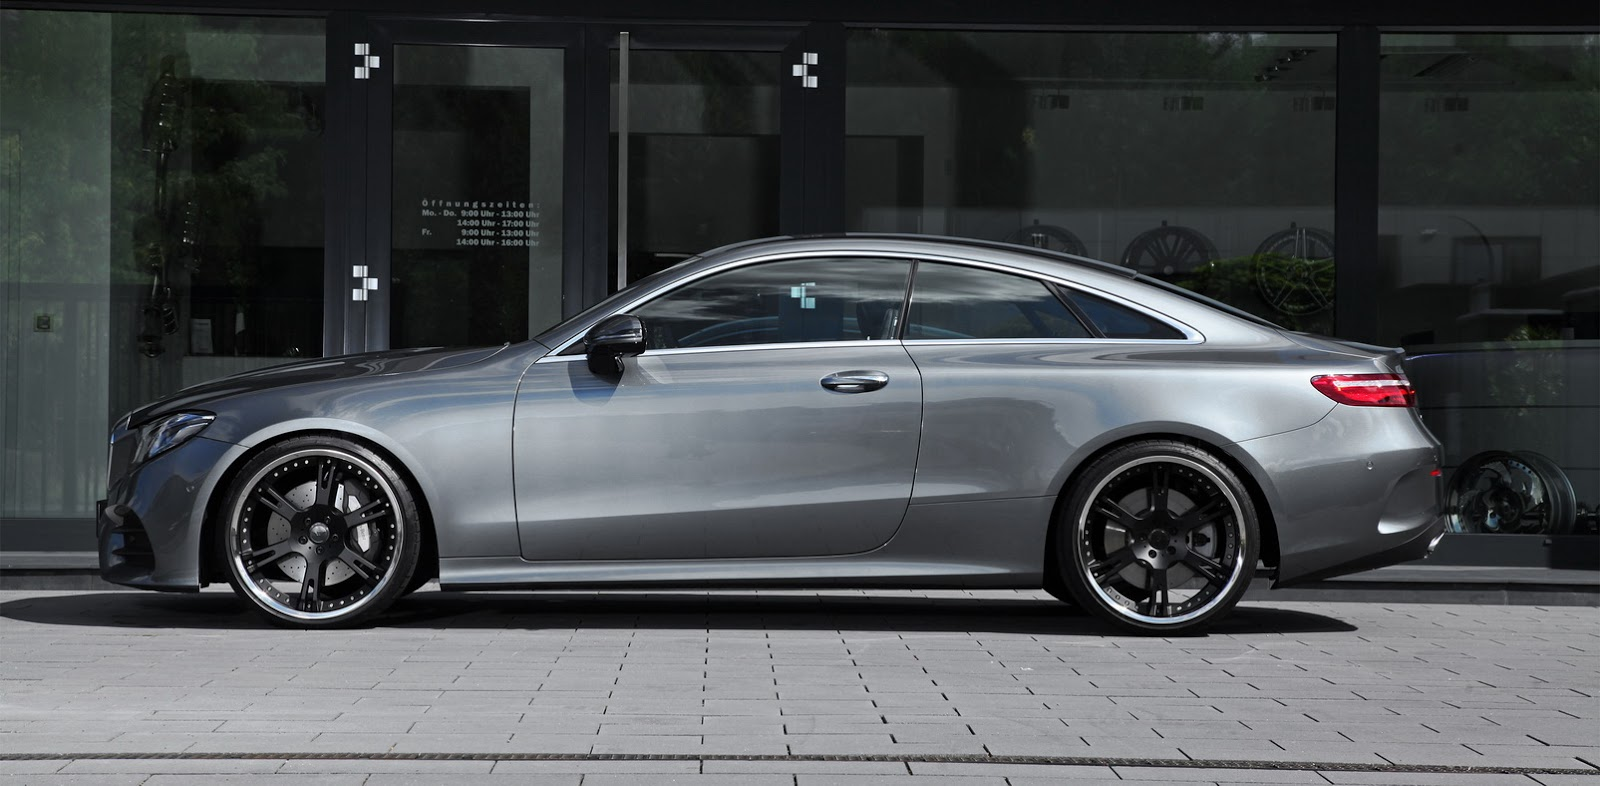 Wheelsandmore Presents Tuning Program For W213 Mercedes E